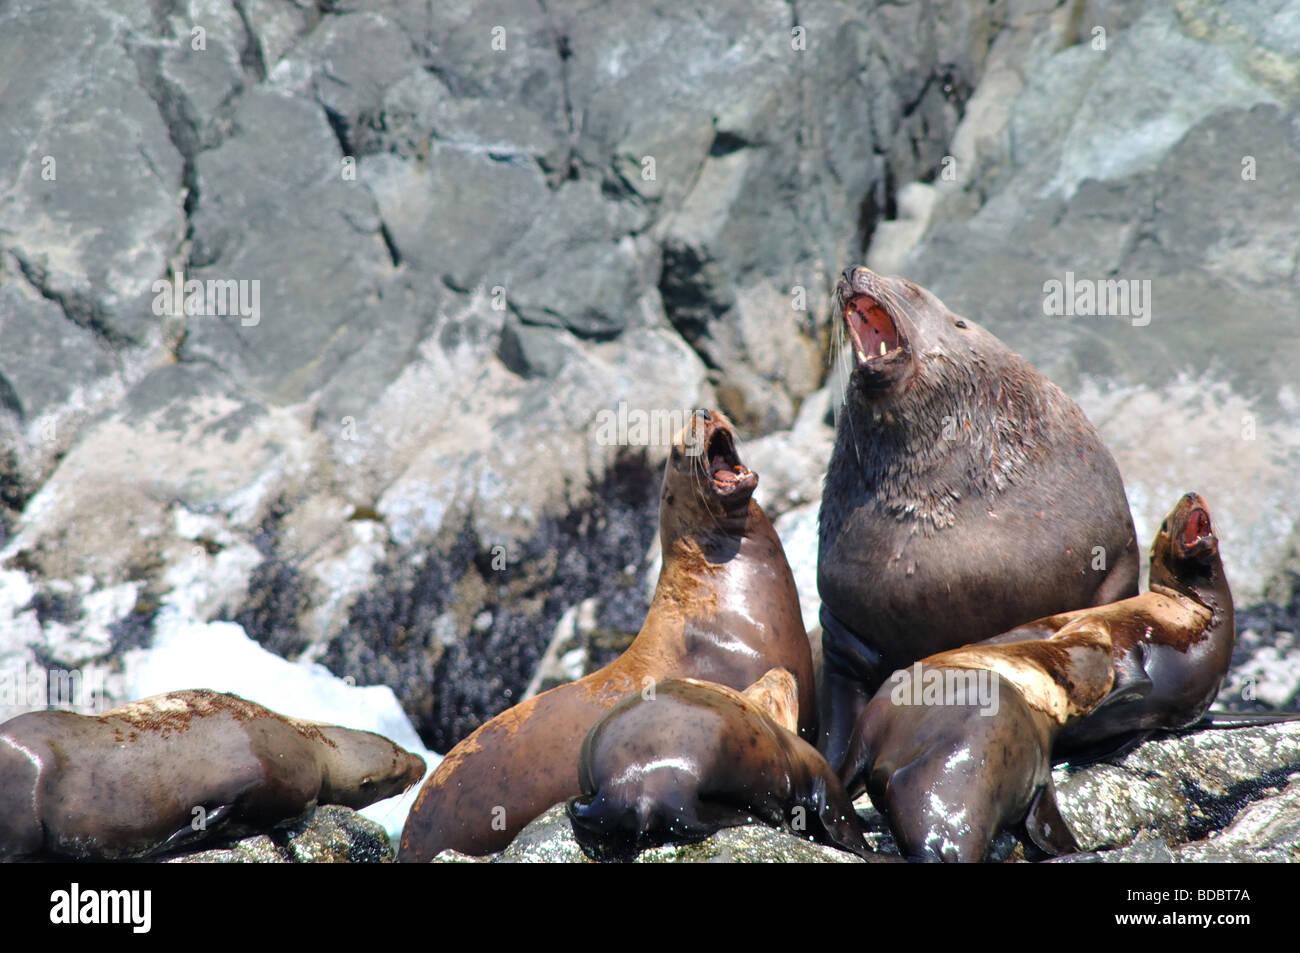 Stellar Sea Lions in the Prince William Sound Alaska Stock Photo